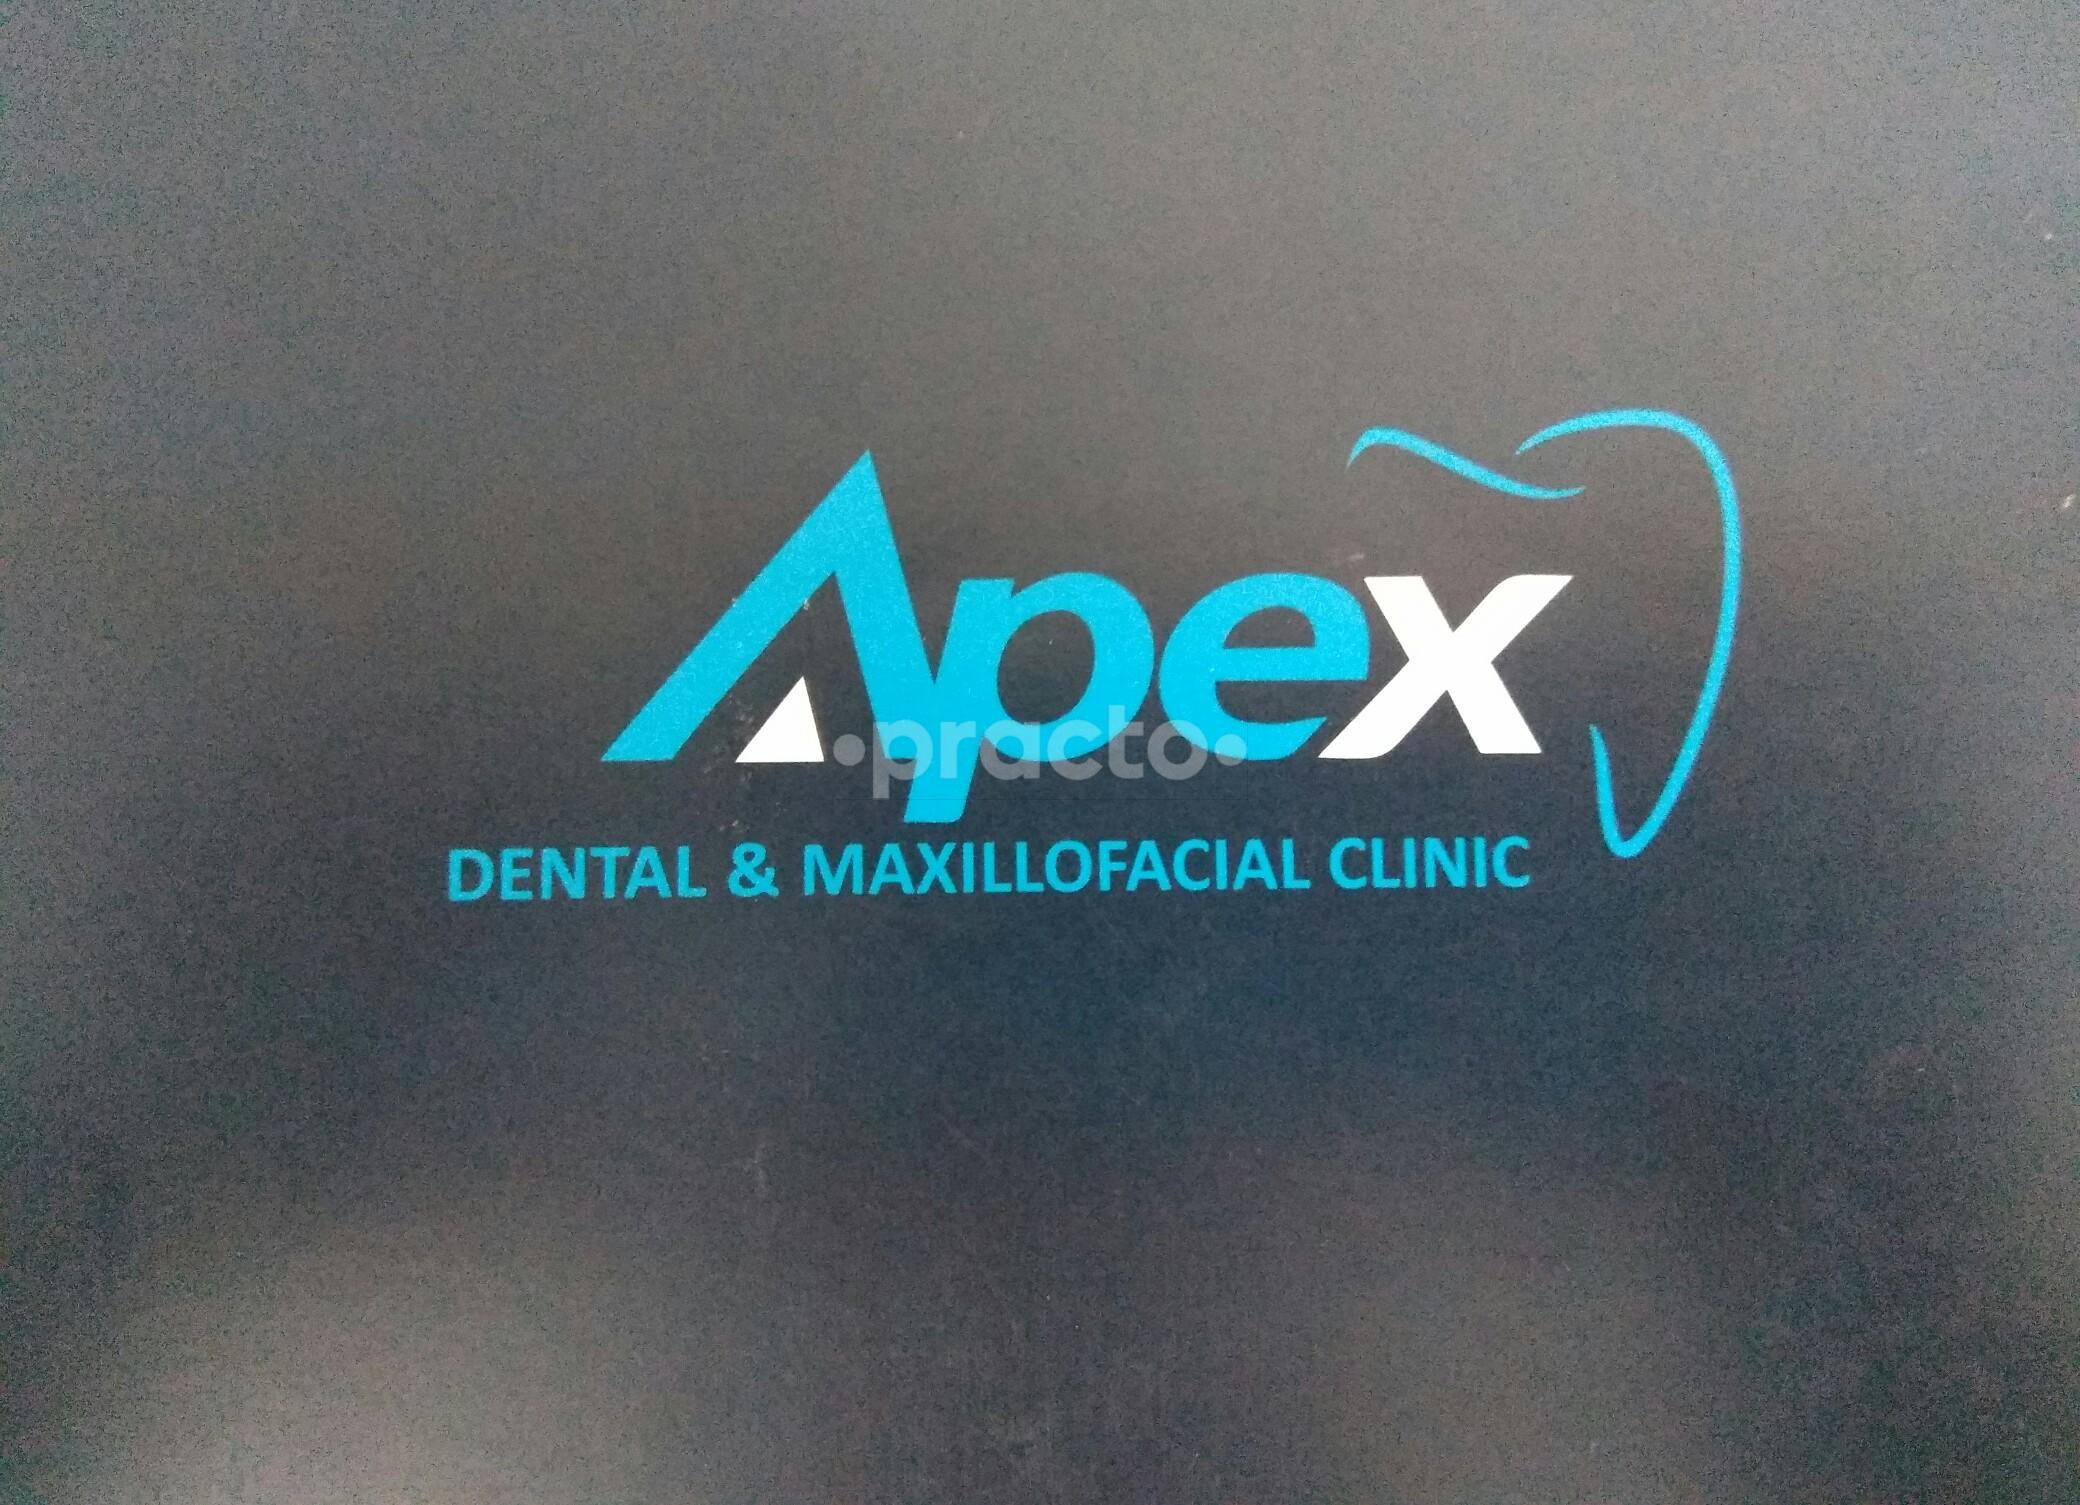 Apex Dental & Maxillofacial Clinic